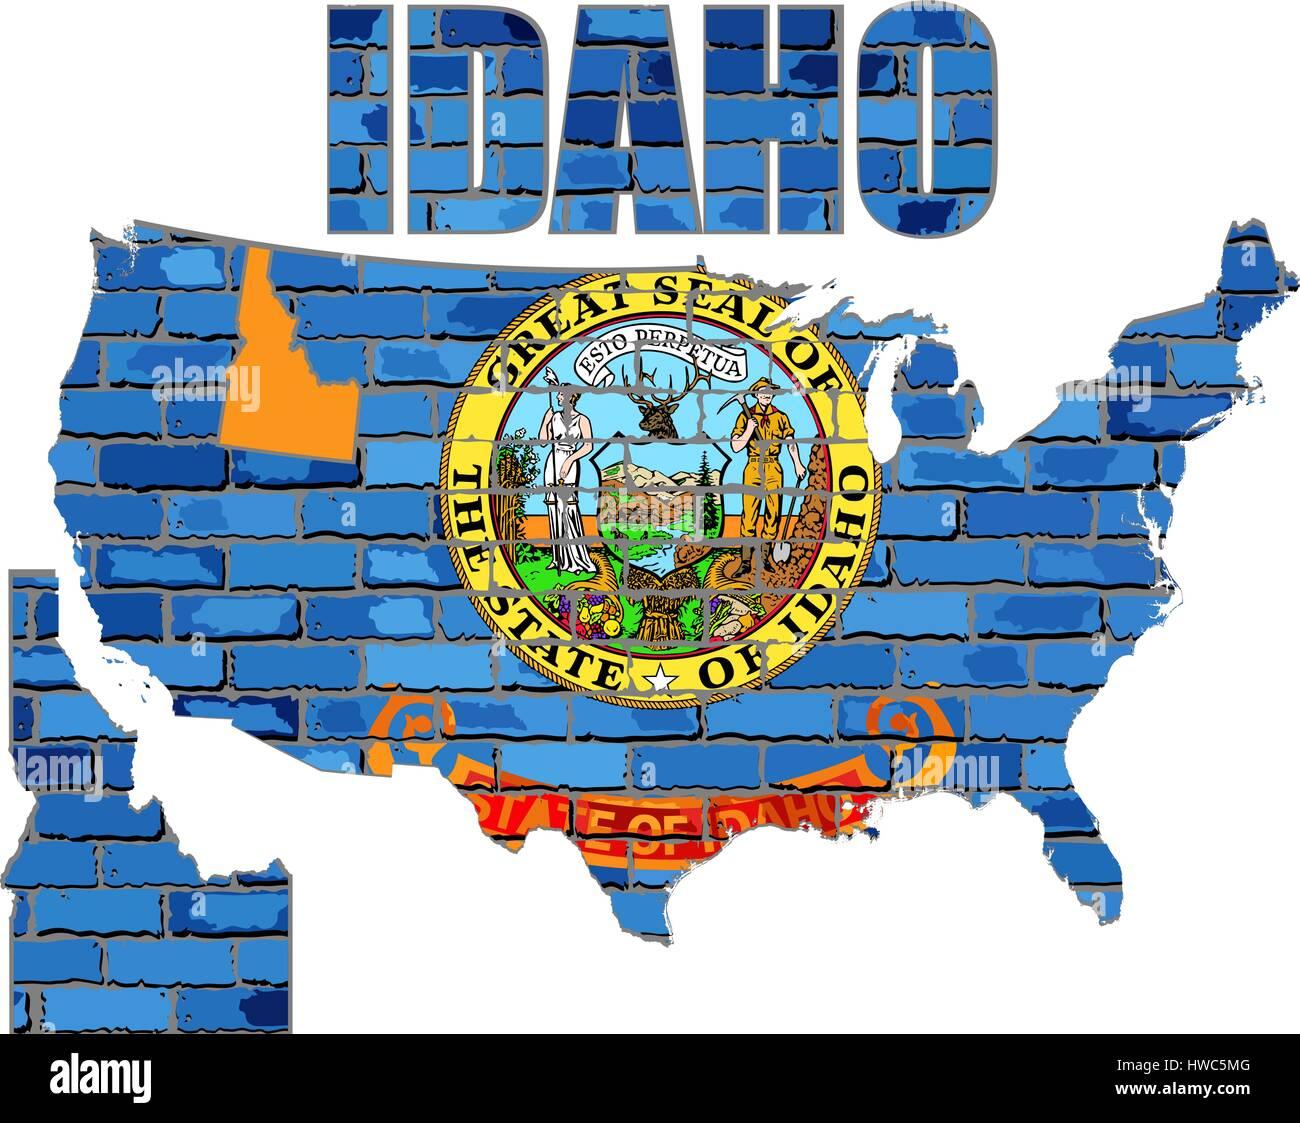 Idaho on a brick wall - Illustration, Font with the Idaho flag,  Idaho map on a brick wall - Stock Vector